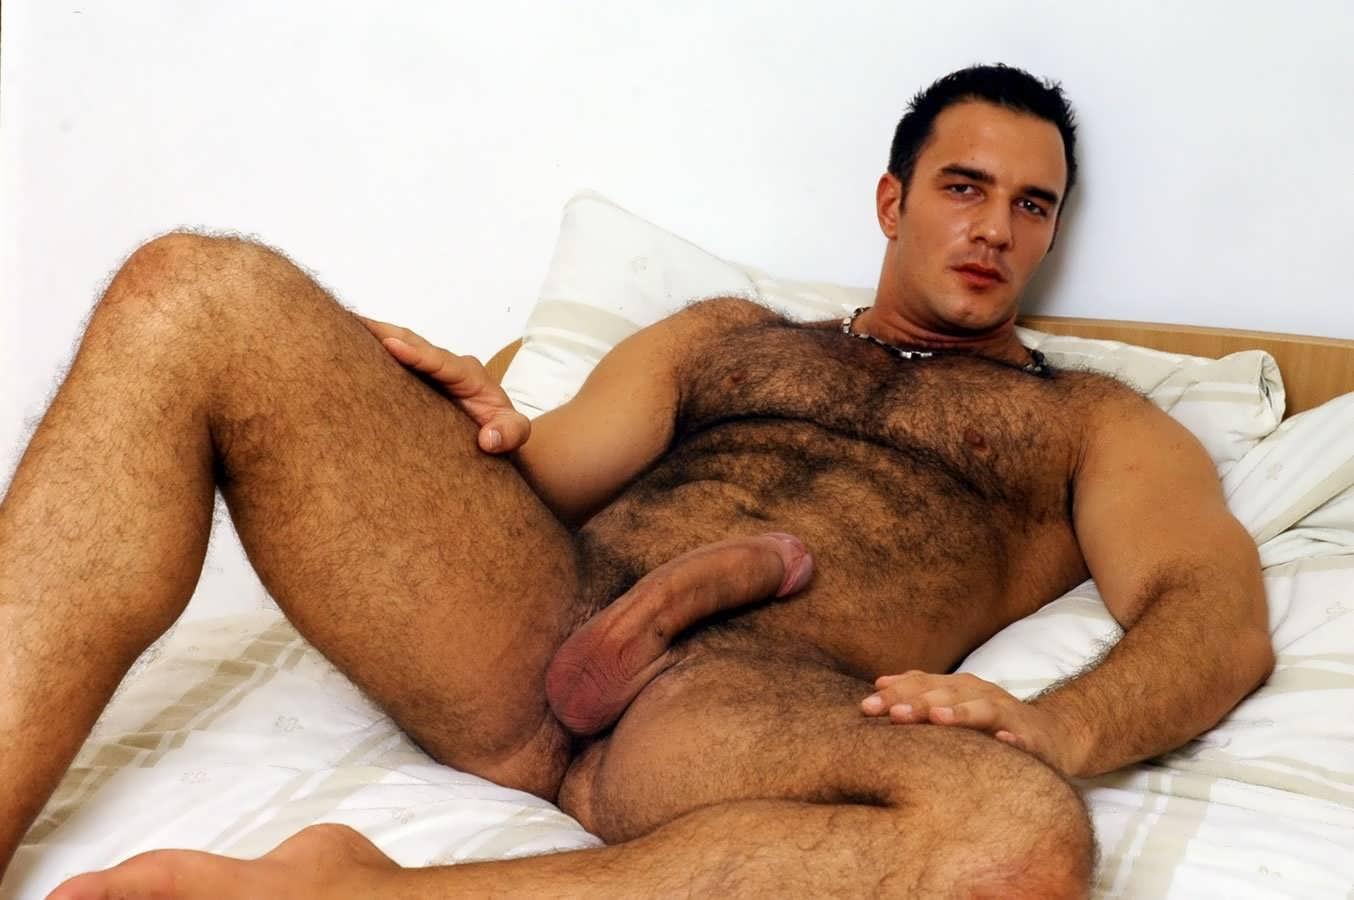 Голые мужчины порно